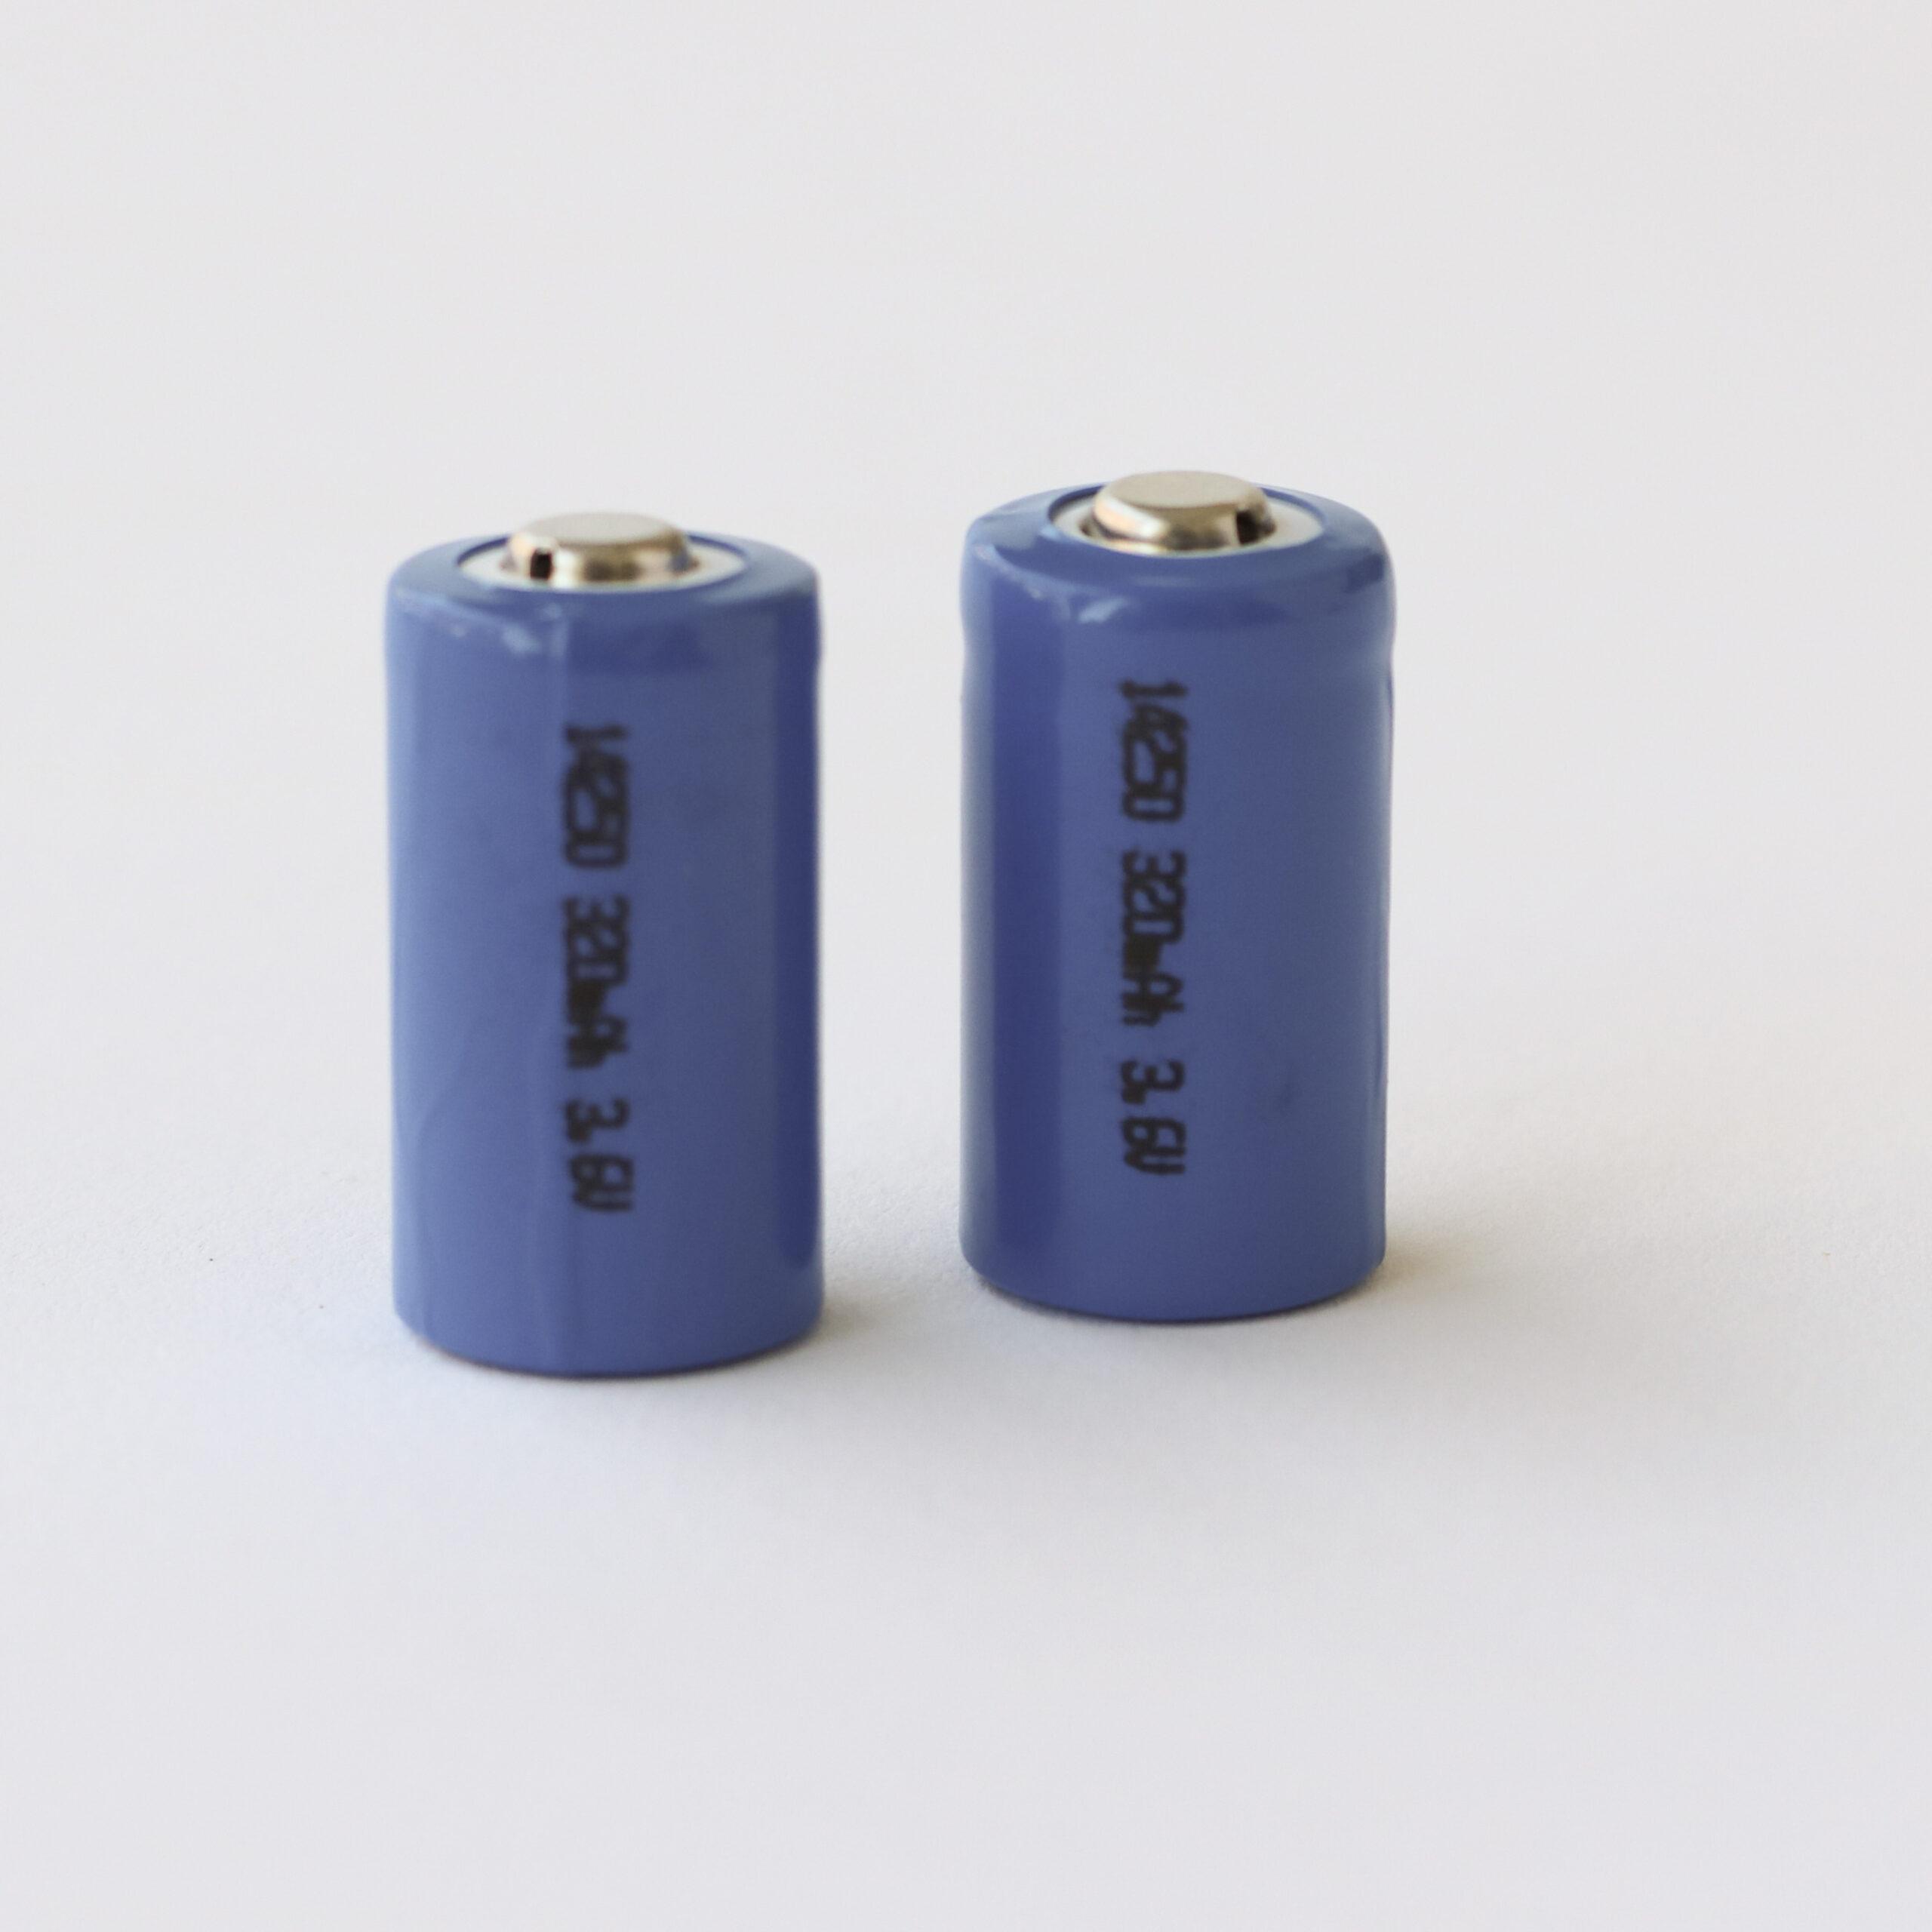 Rechargeable Lithium Ion Batteries FETB Hoggan Scientific